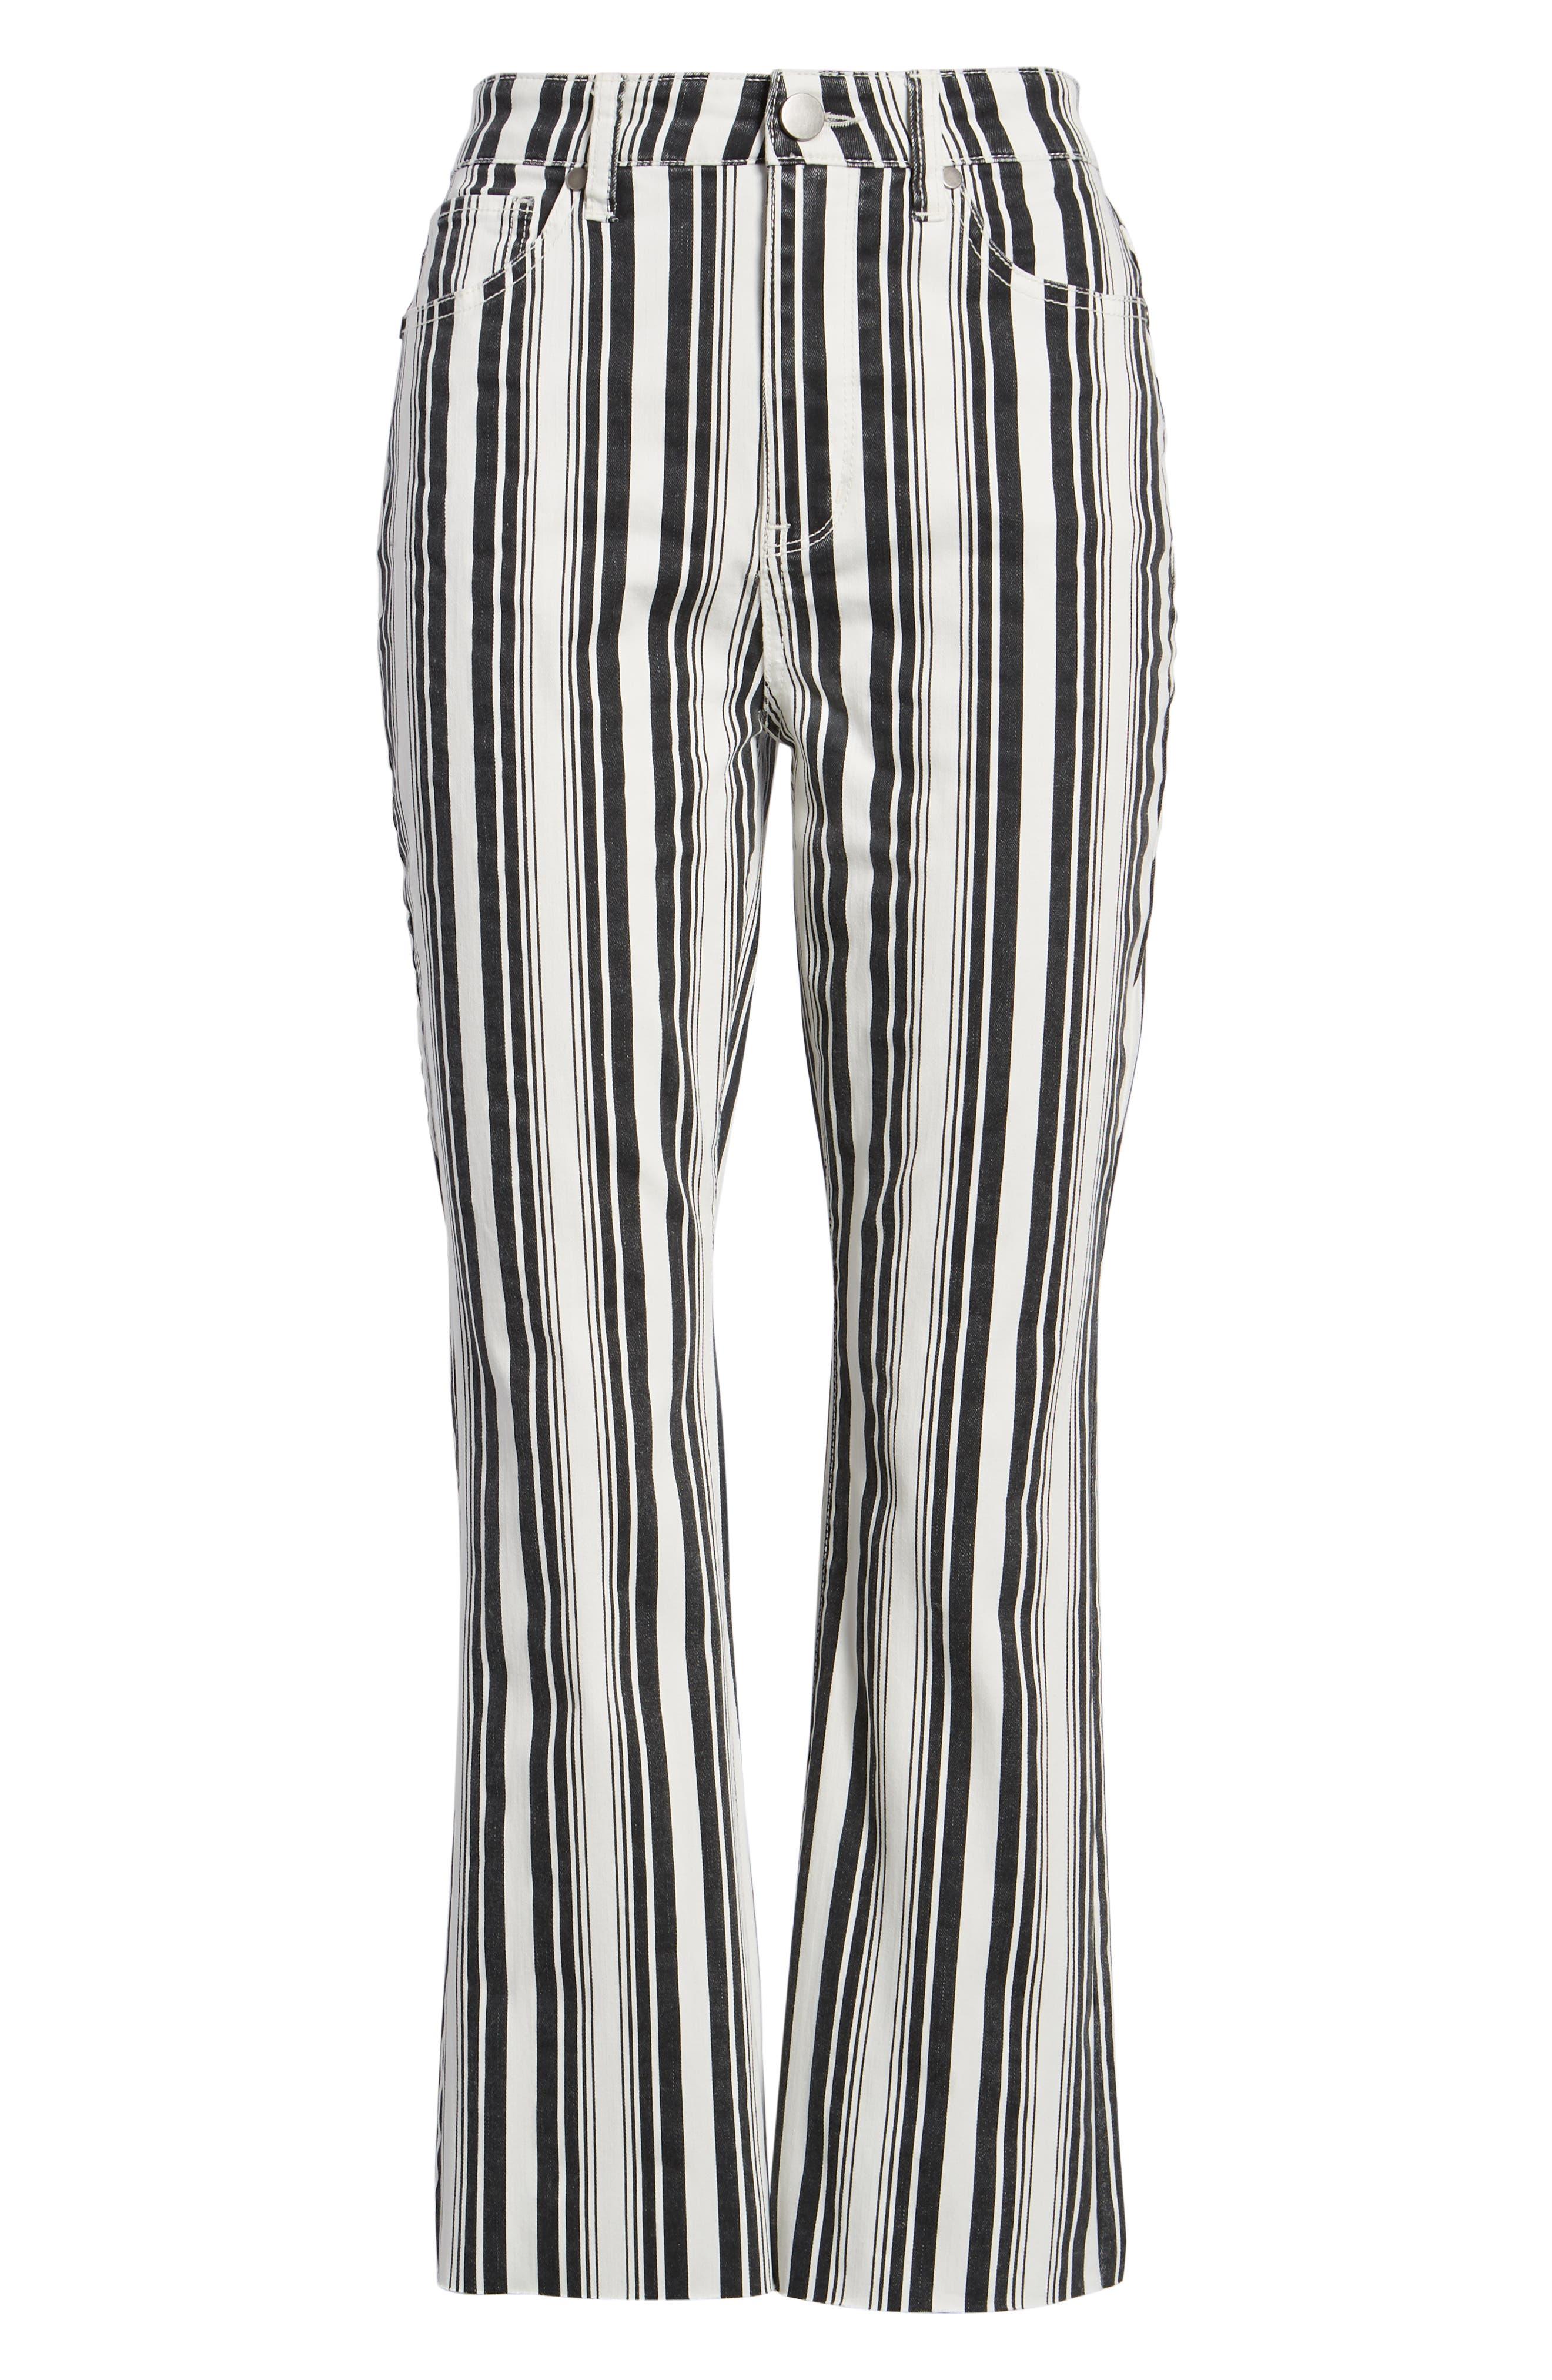 TINSEL, Stripe Crop Flare Jeans, Alternate thumbnail 7, color, WHITE BLACK